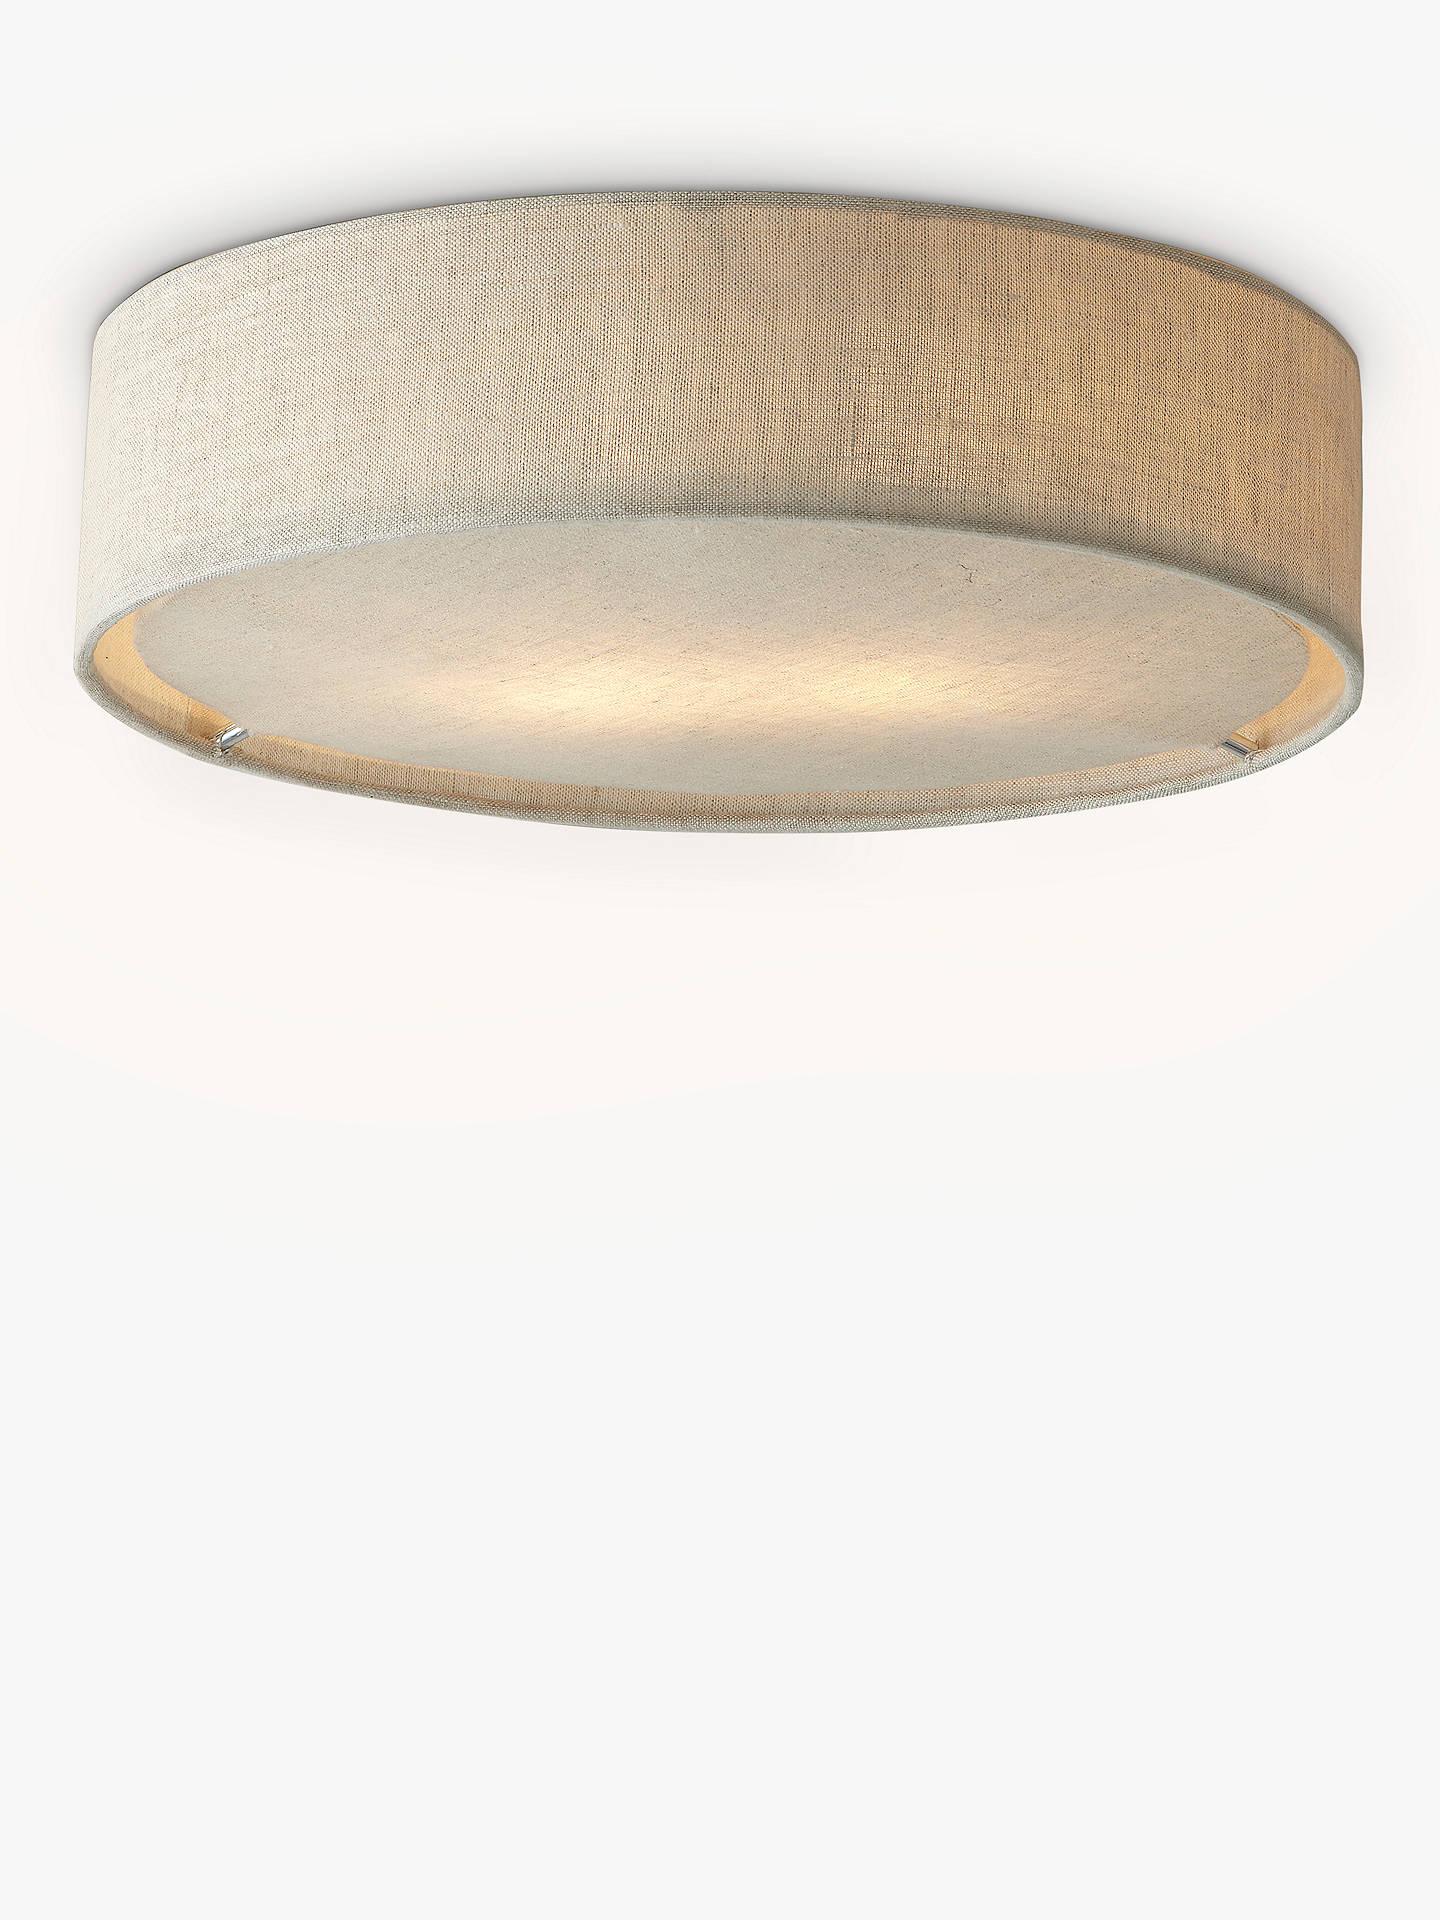 Buyjohn lewis partners samantha linen flush ceiling light online at johnlewis